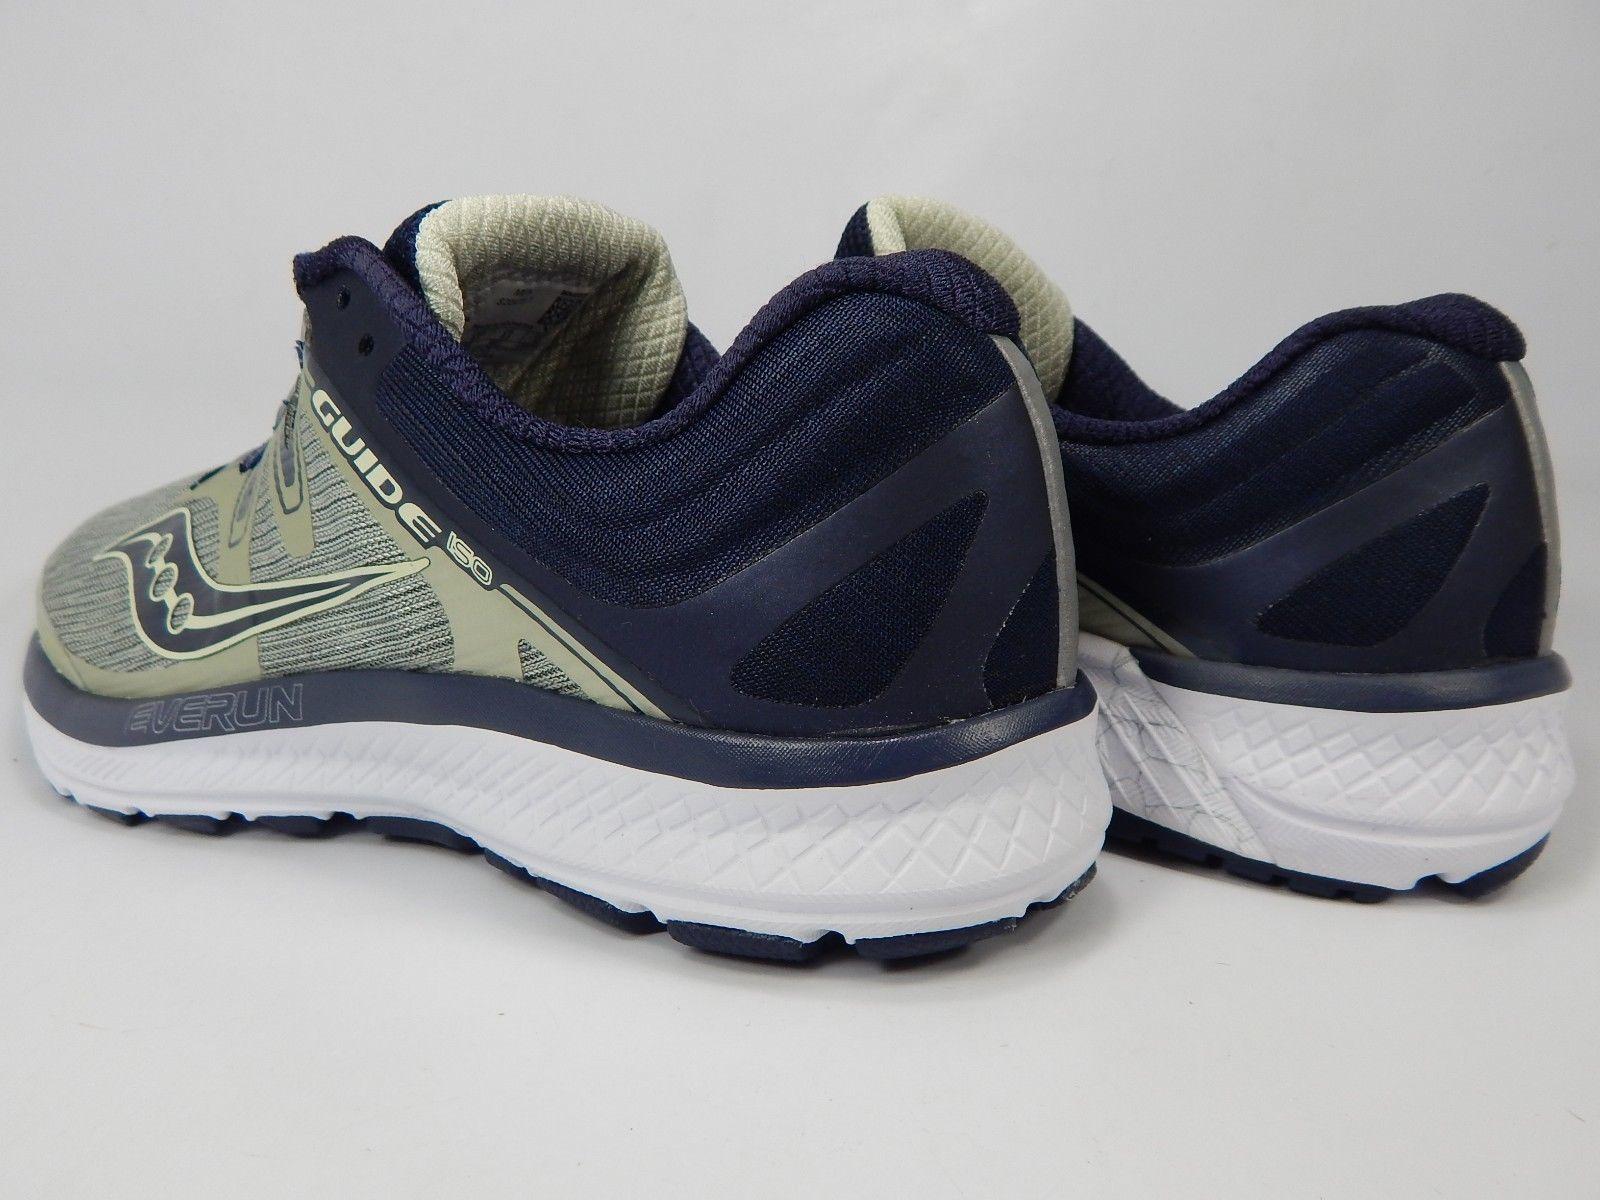 Saucony Guide ISO Size 9.5 M (D) EU 43 Men's Running Shoes Gold Blue S20415-1